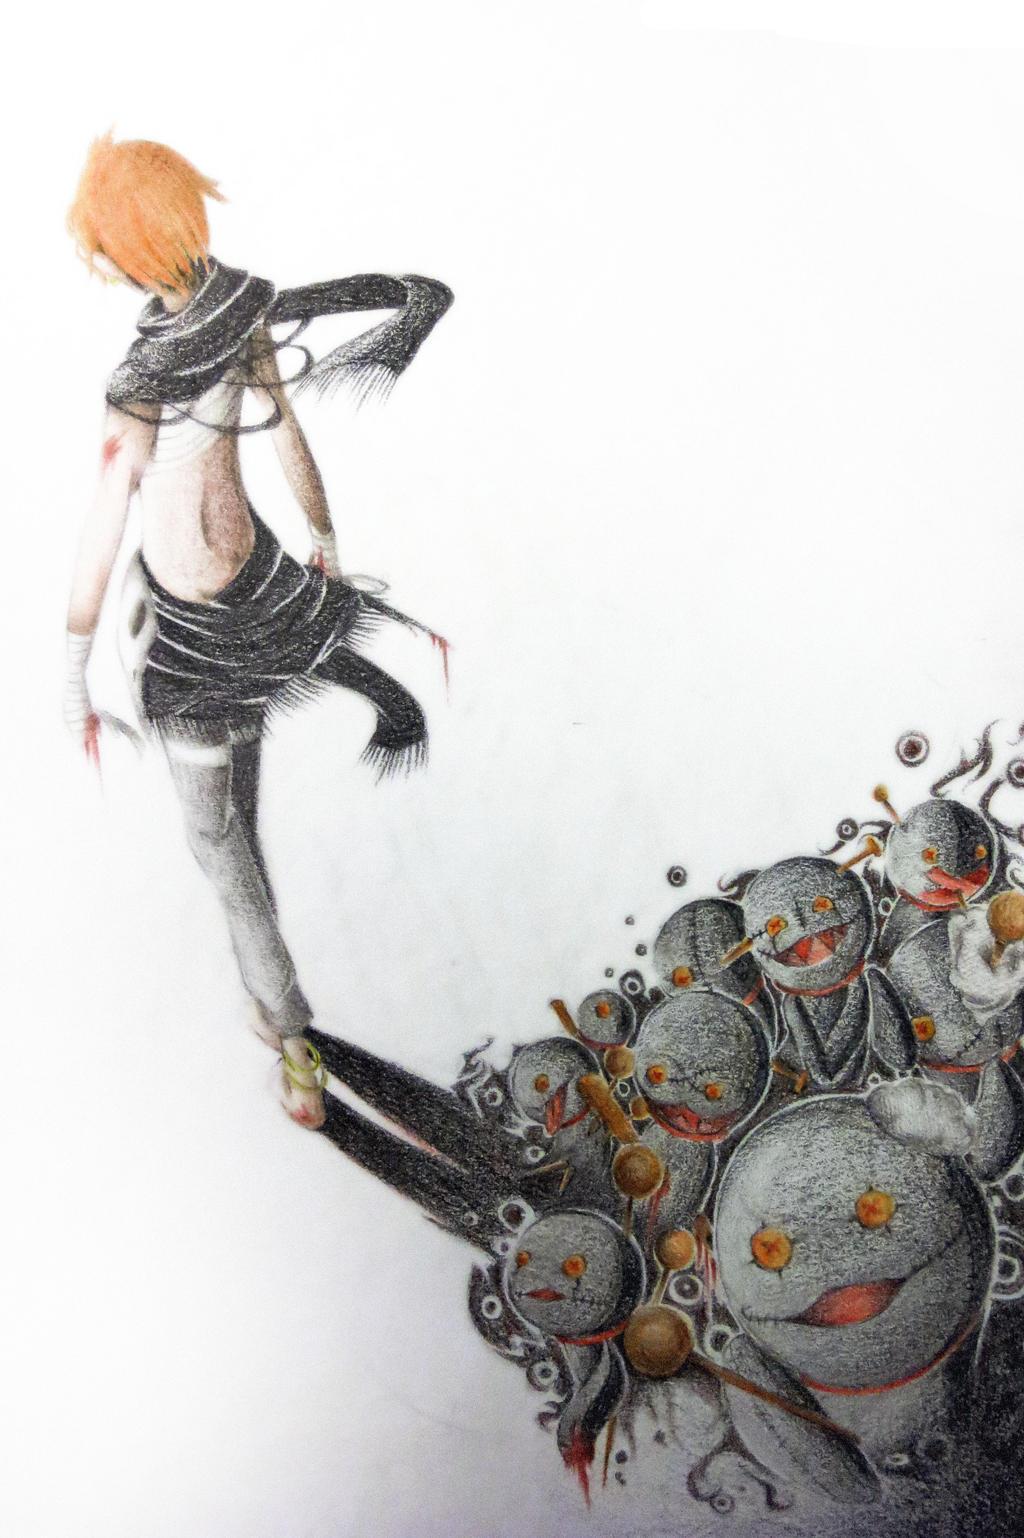 [Otherworlde Contest] by Zungie